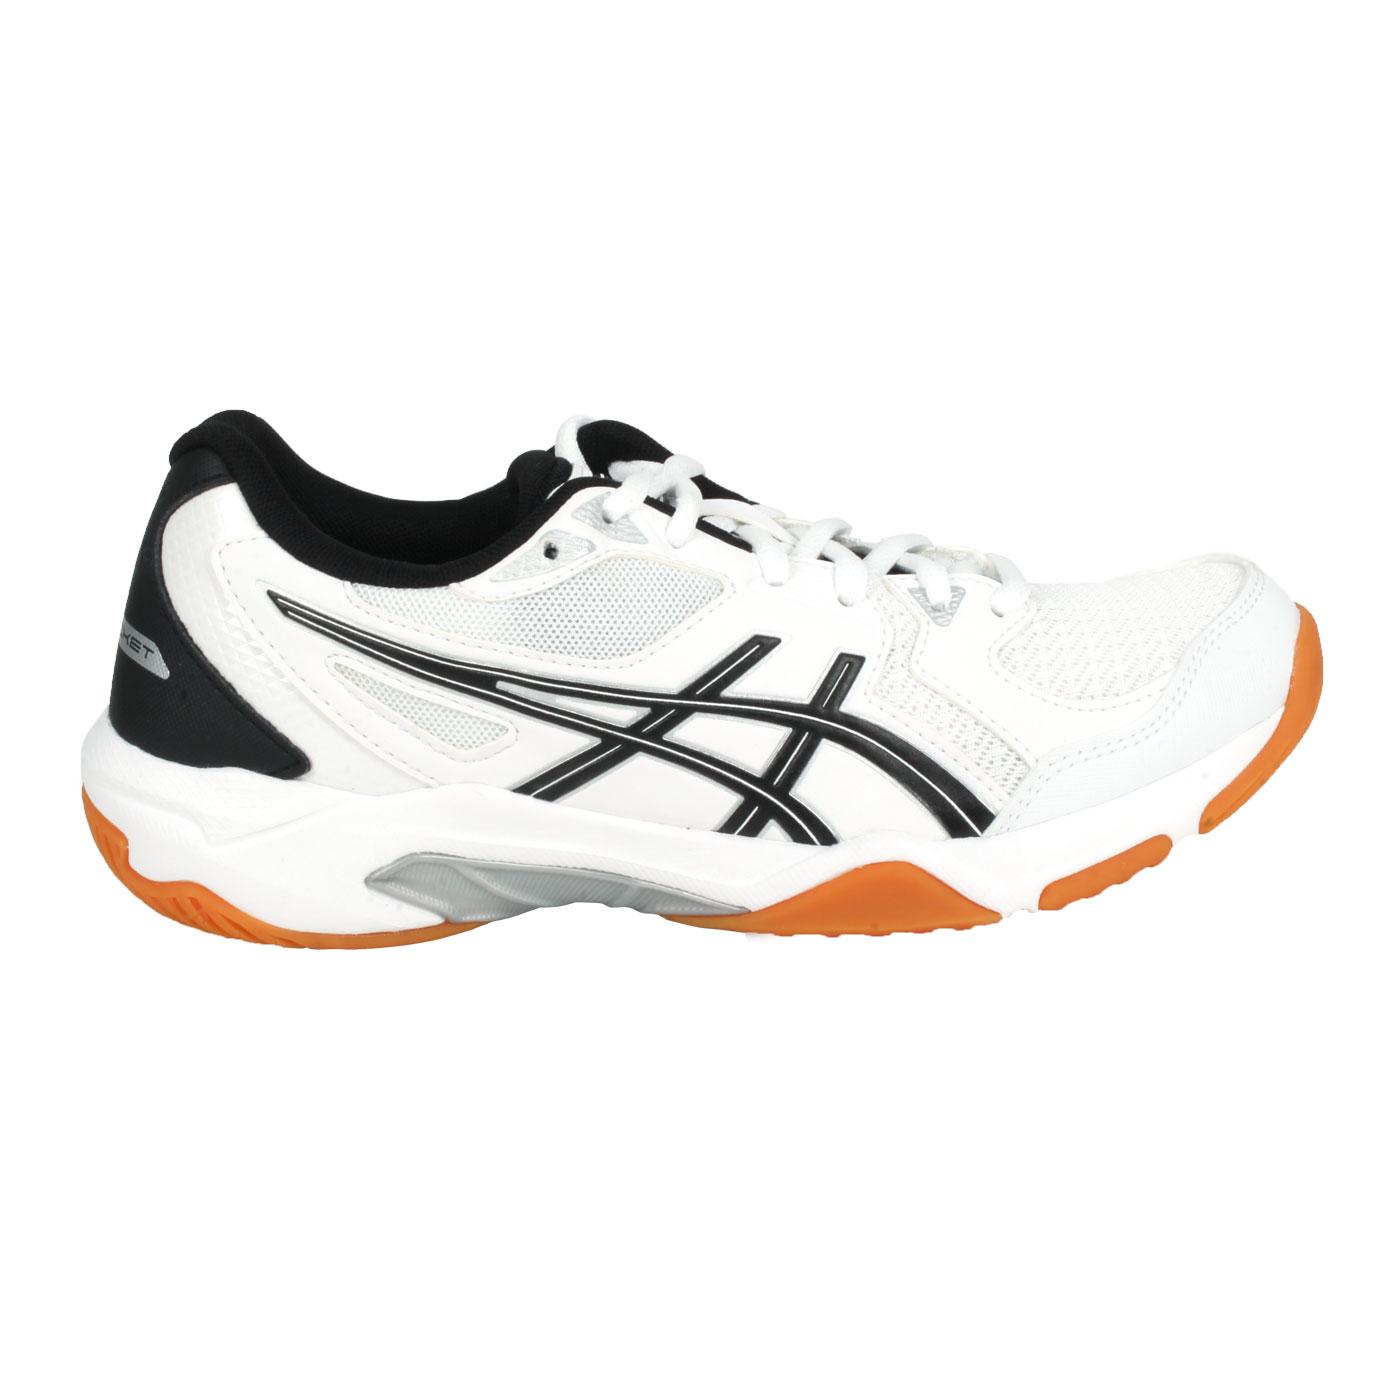 ASICS 女款排羽球鞋  @GEL-ROCKET 10@1072A056-104 - 白黑銀